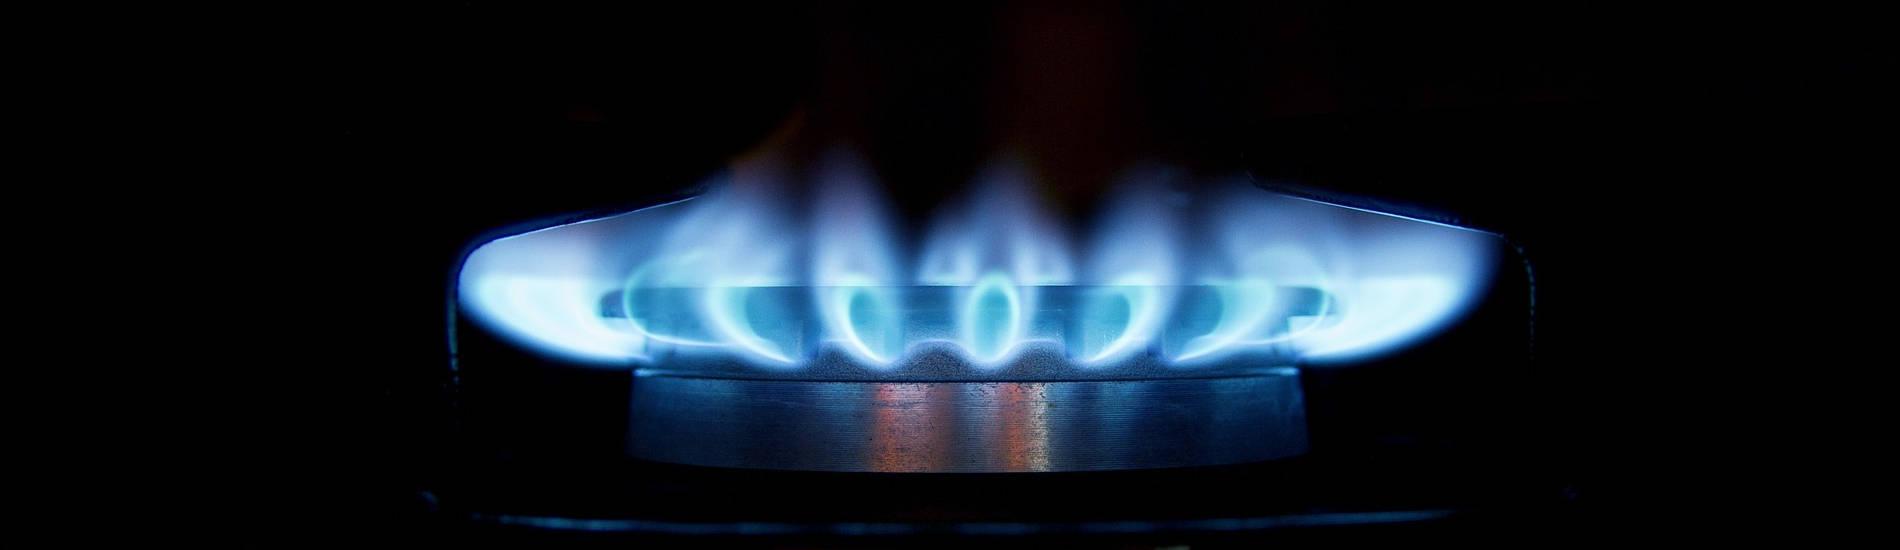 boiler replacement tradesmen